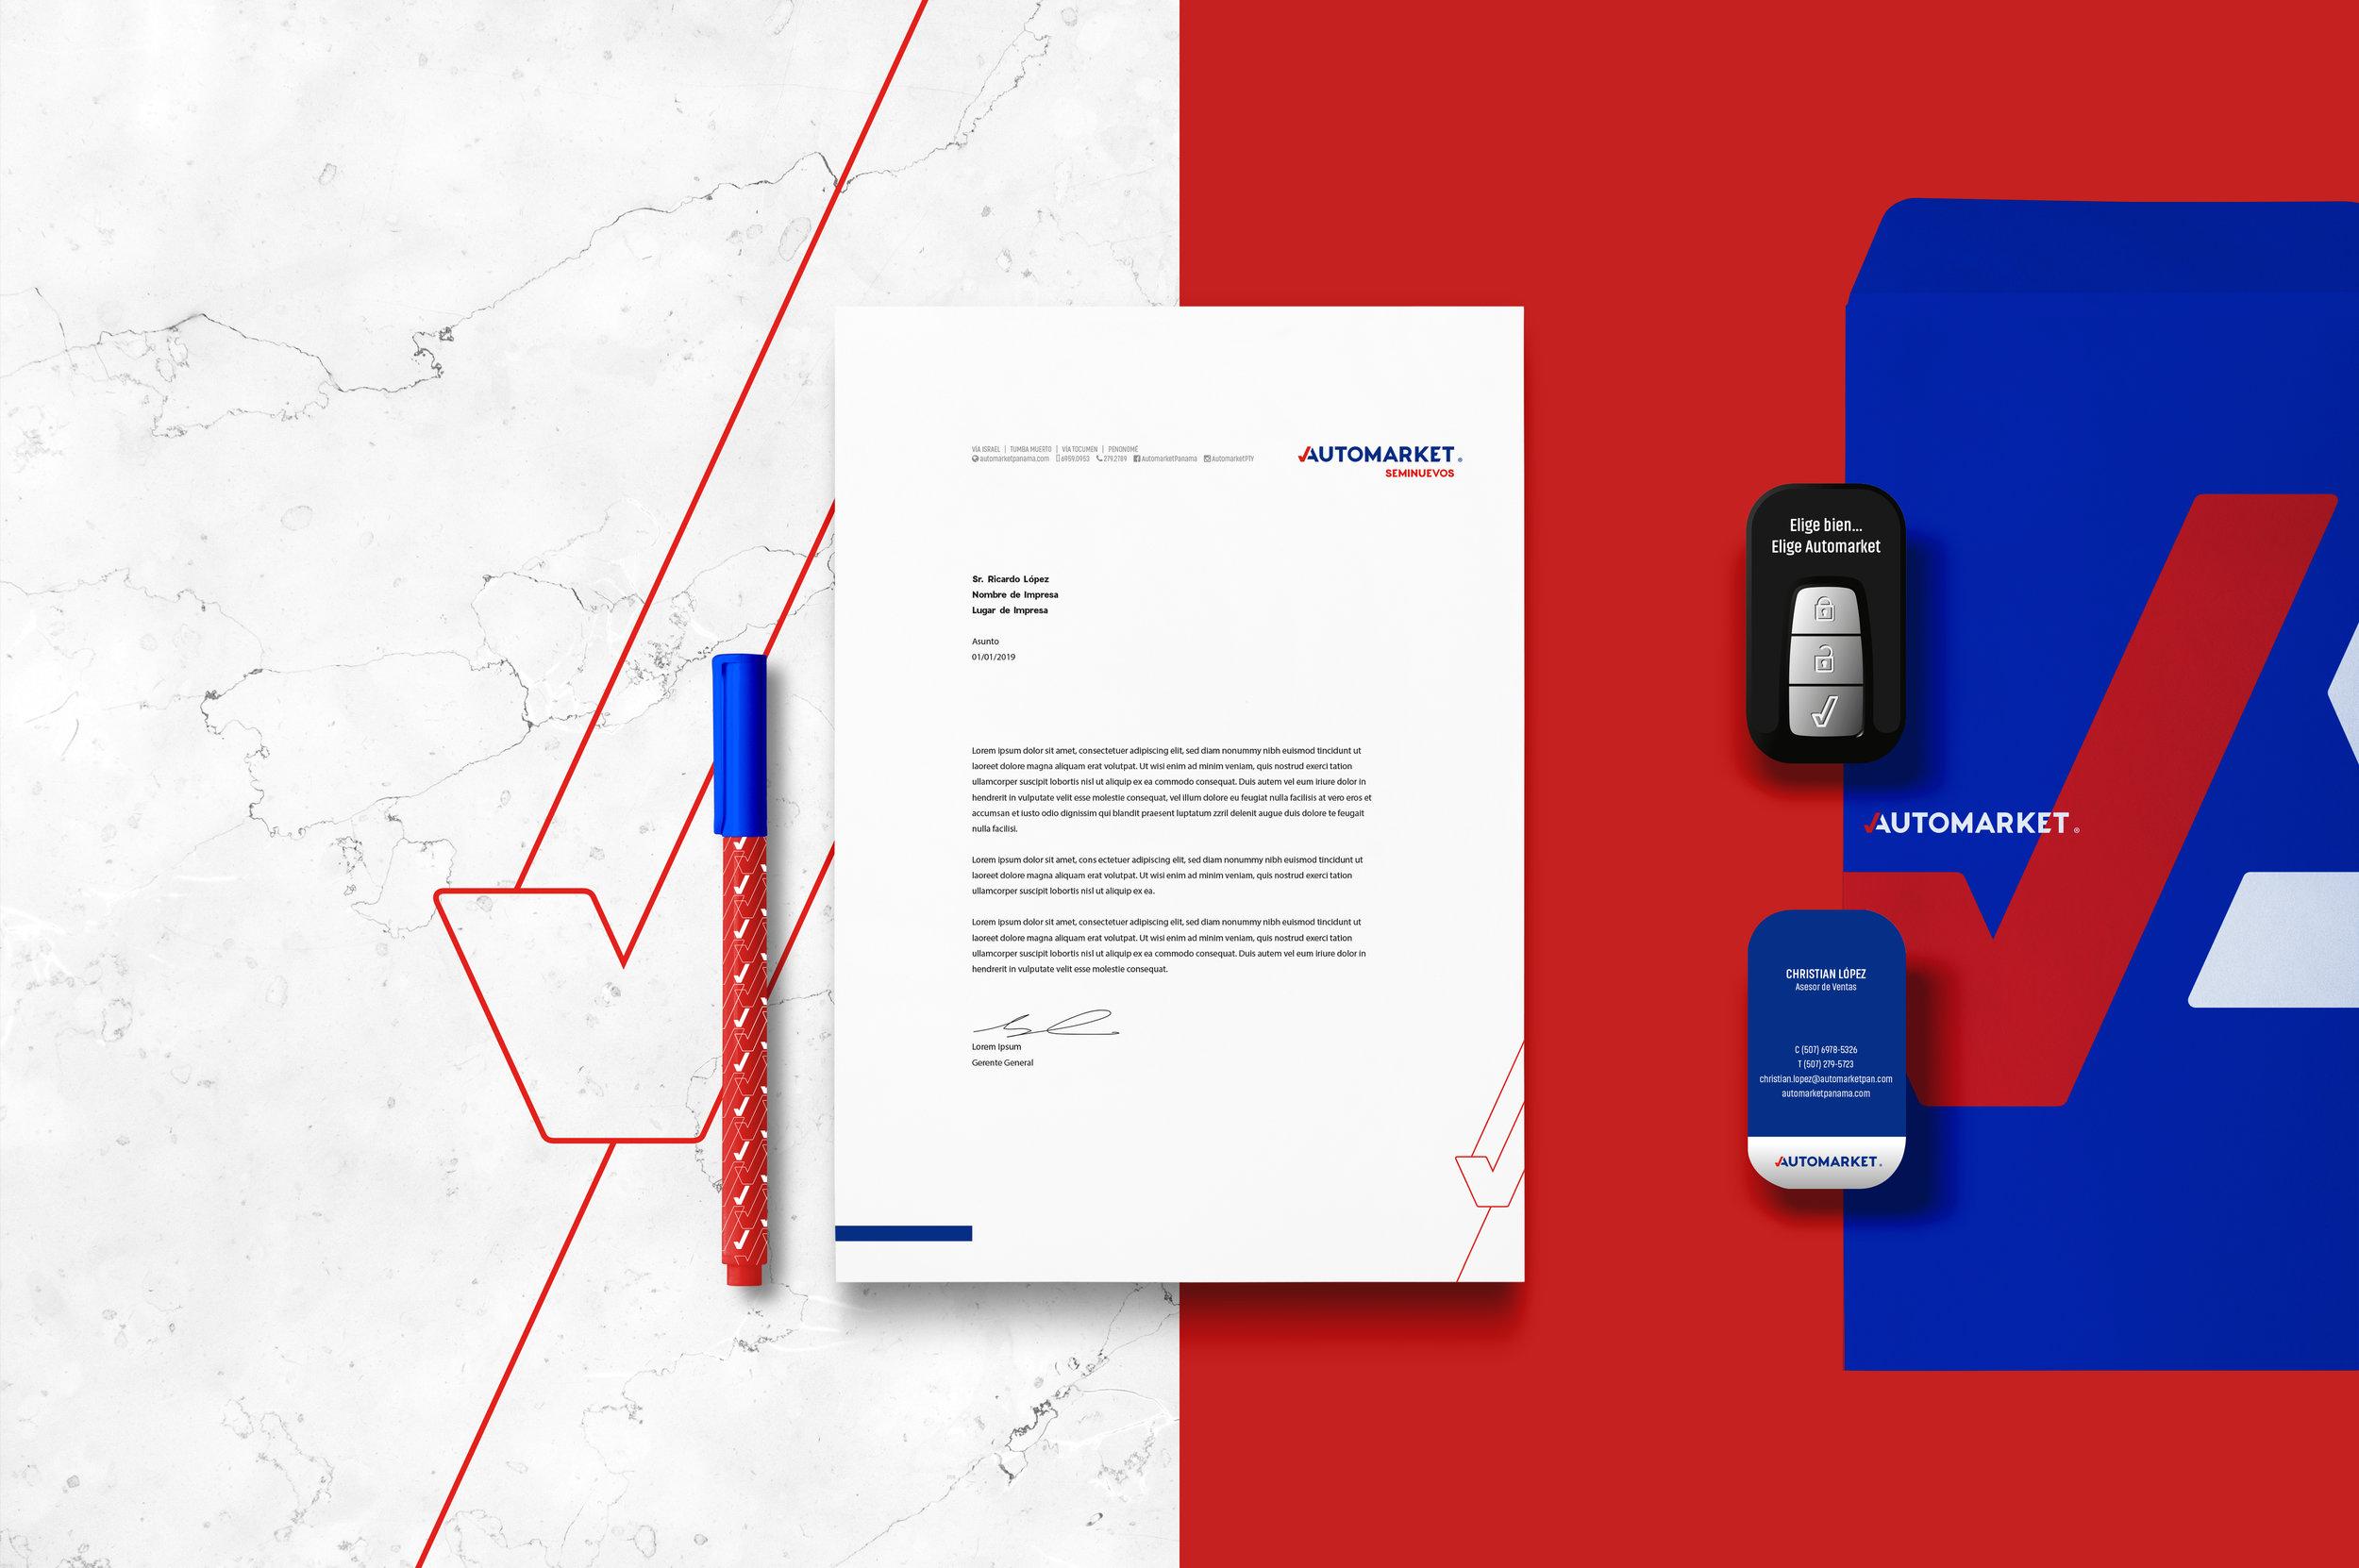 Automarket-BrandIdentity-1.jpg